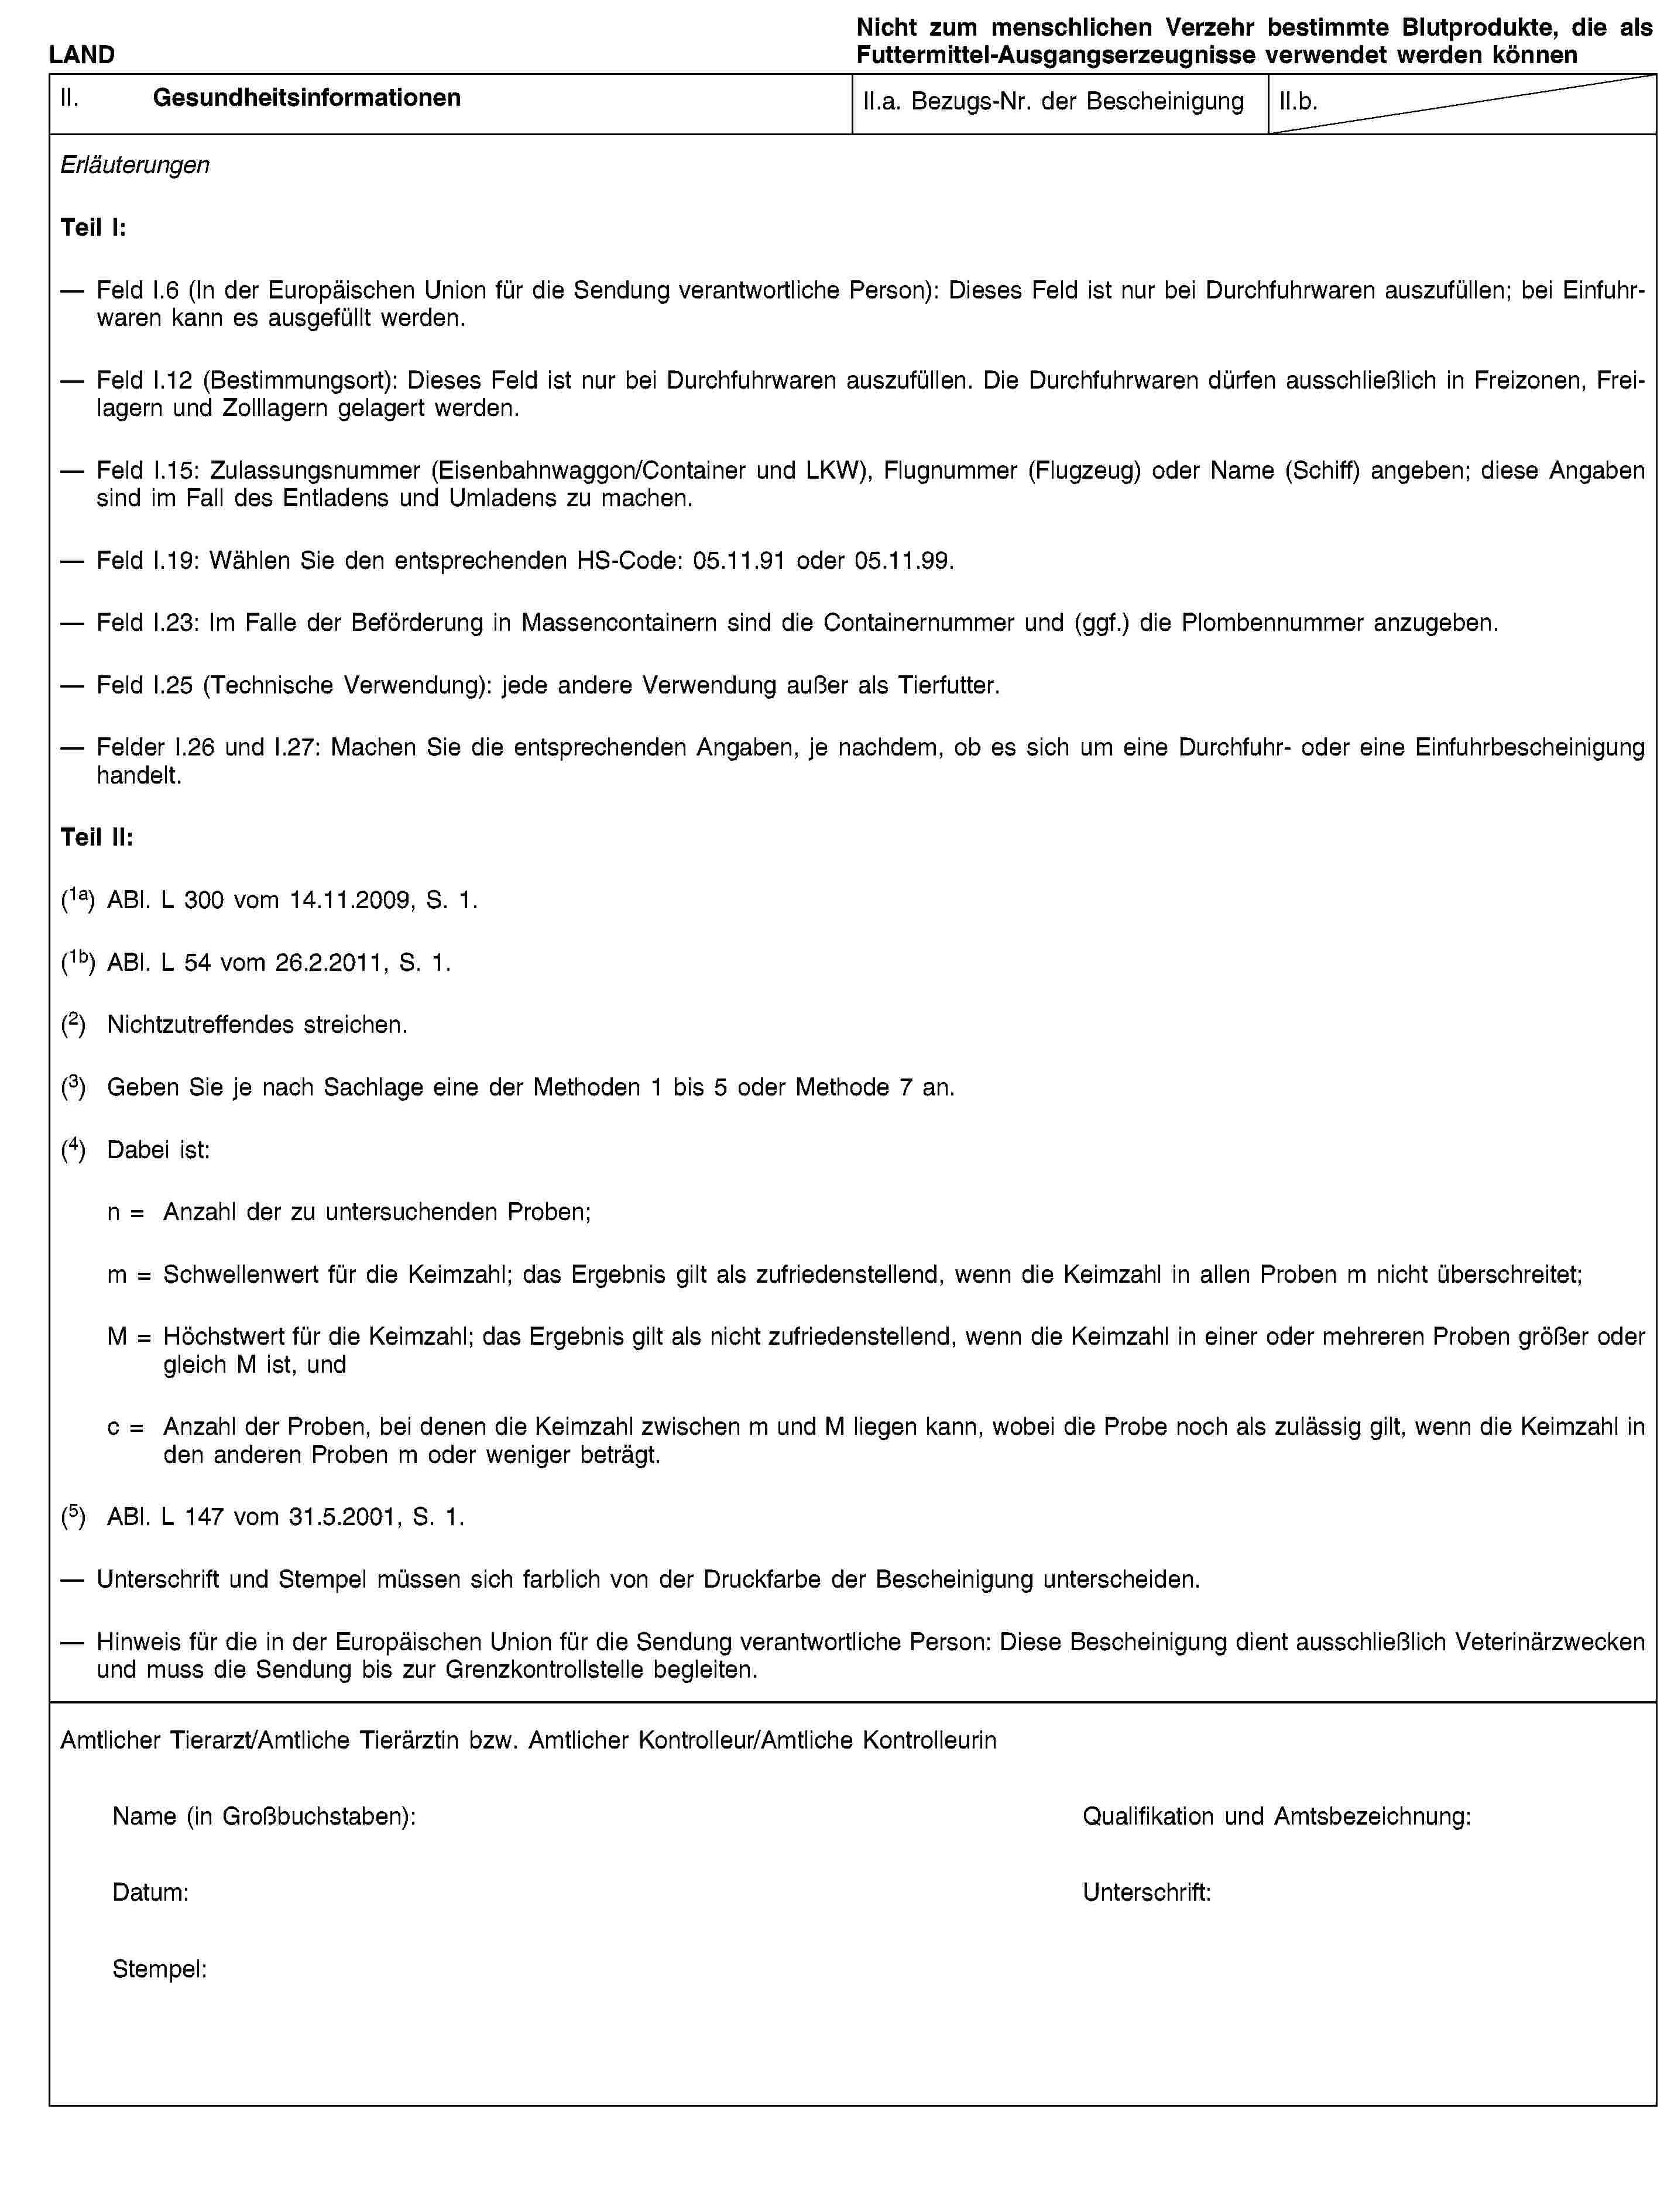 EUR-Lex - 02011R0142-20130315 - EN - EUR-Lex